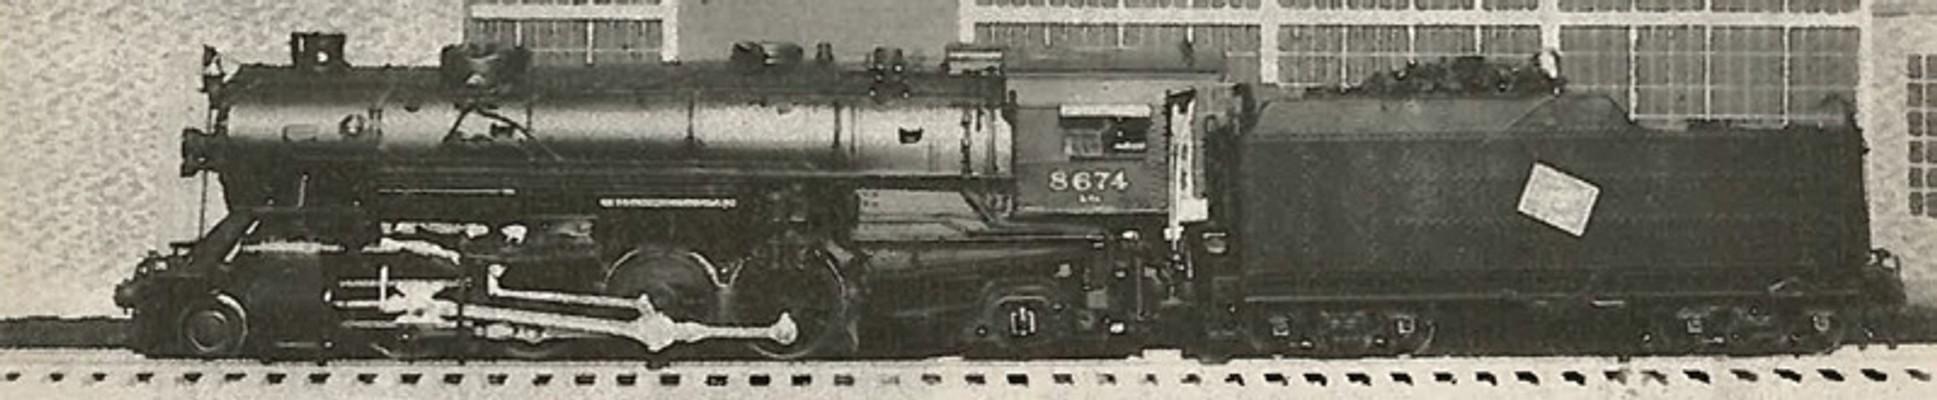 f0022-01